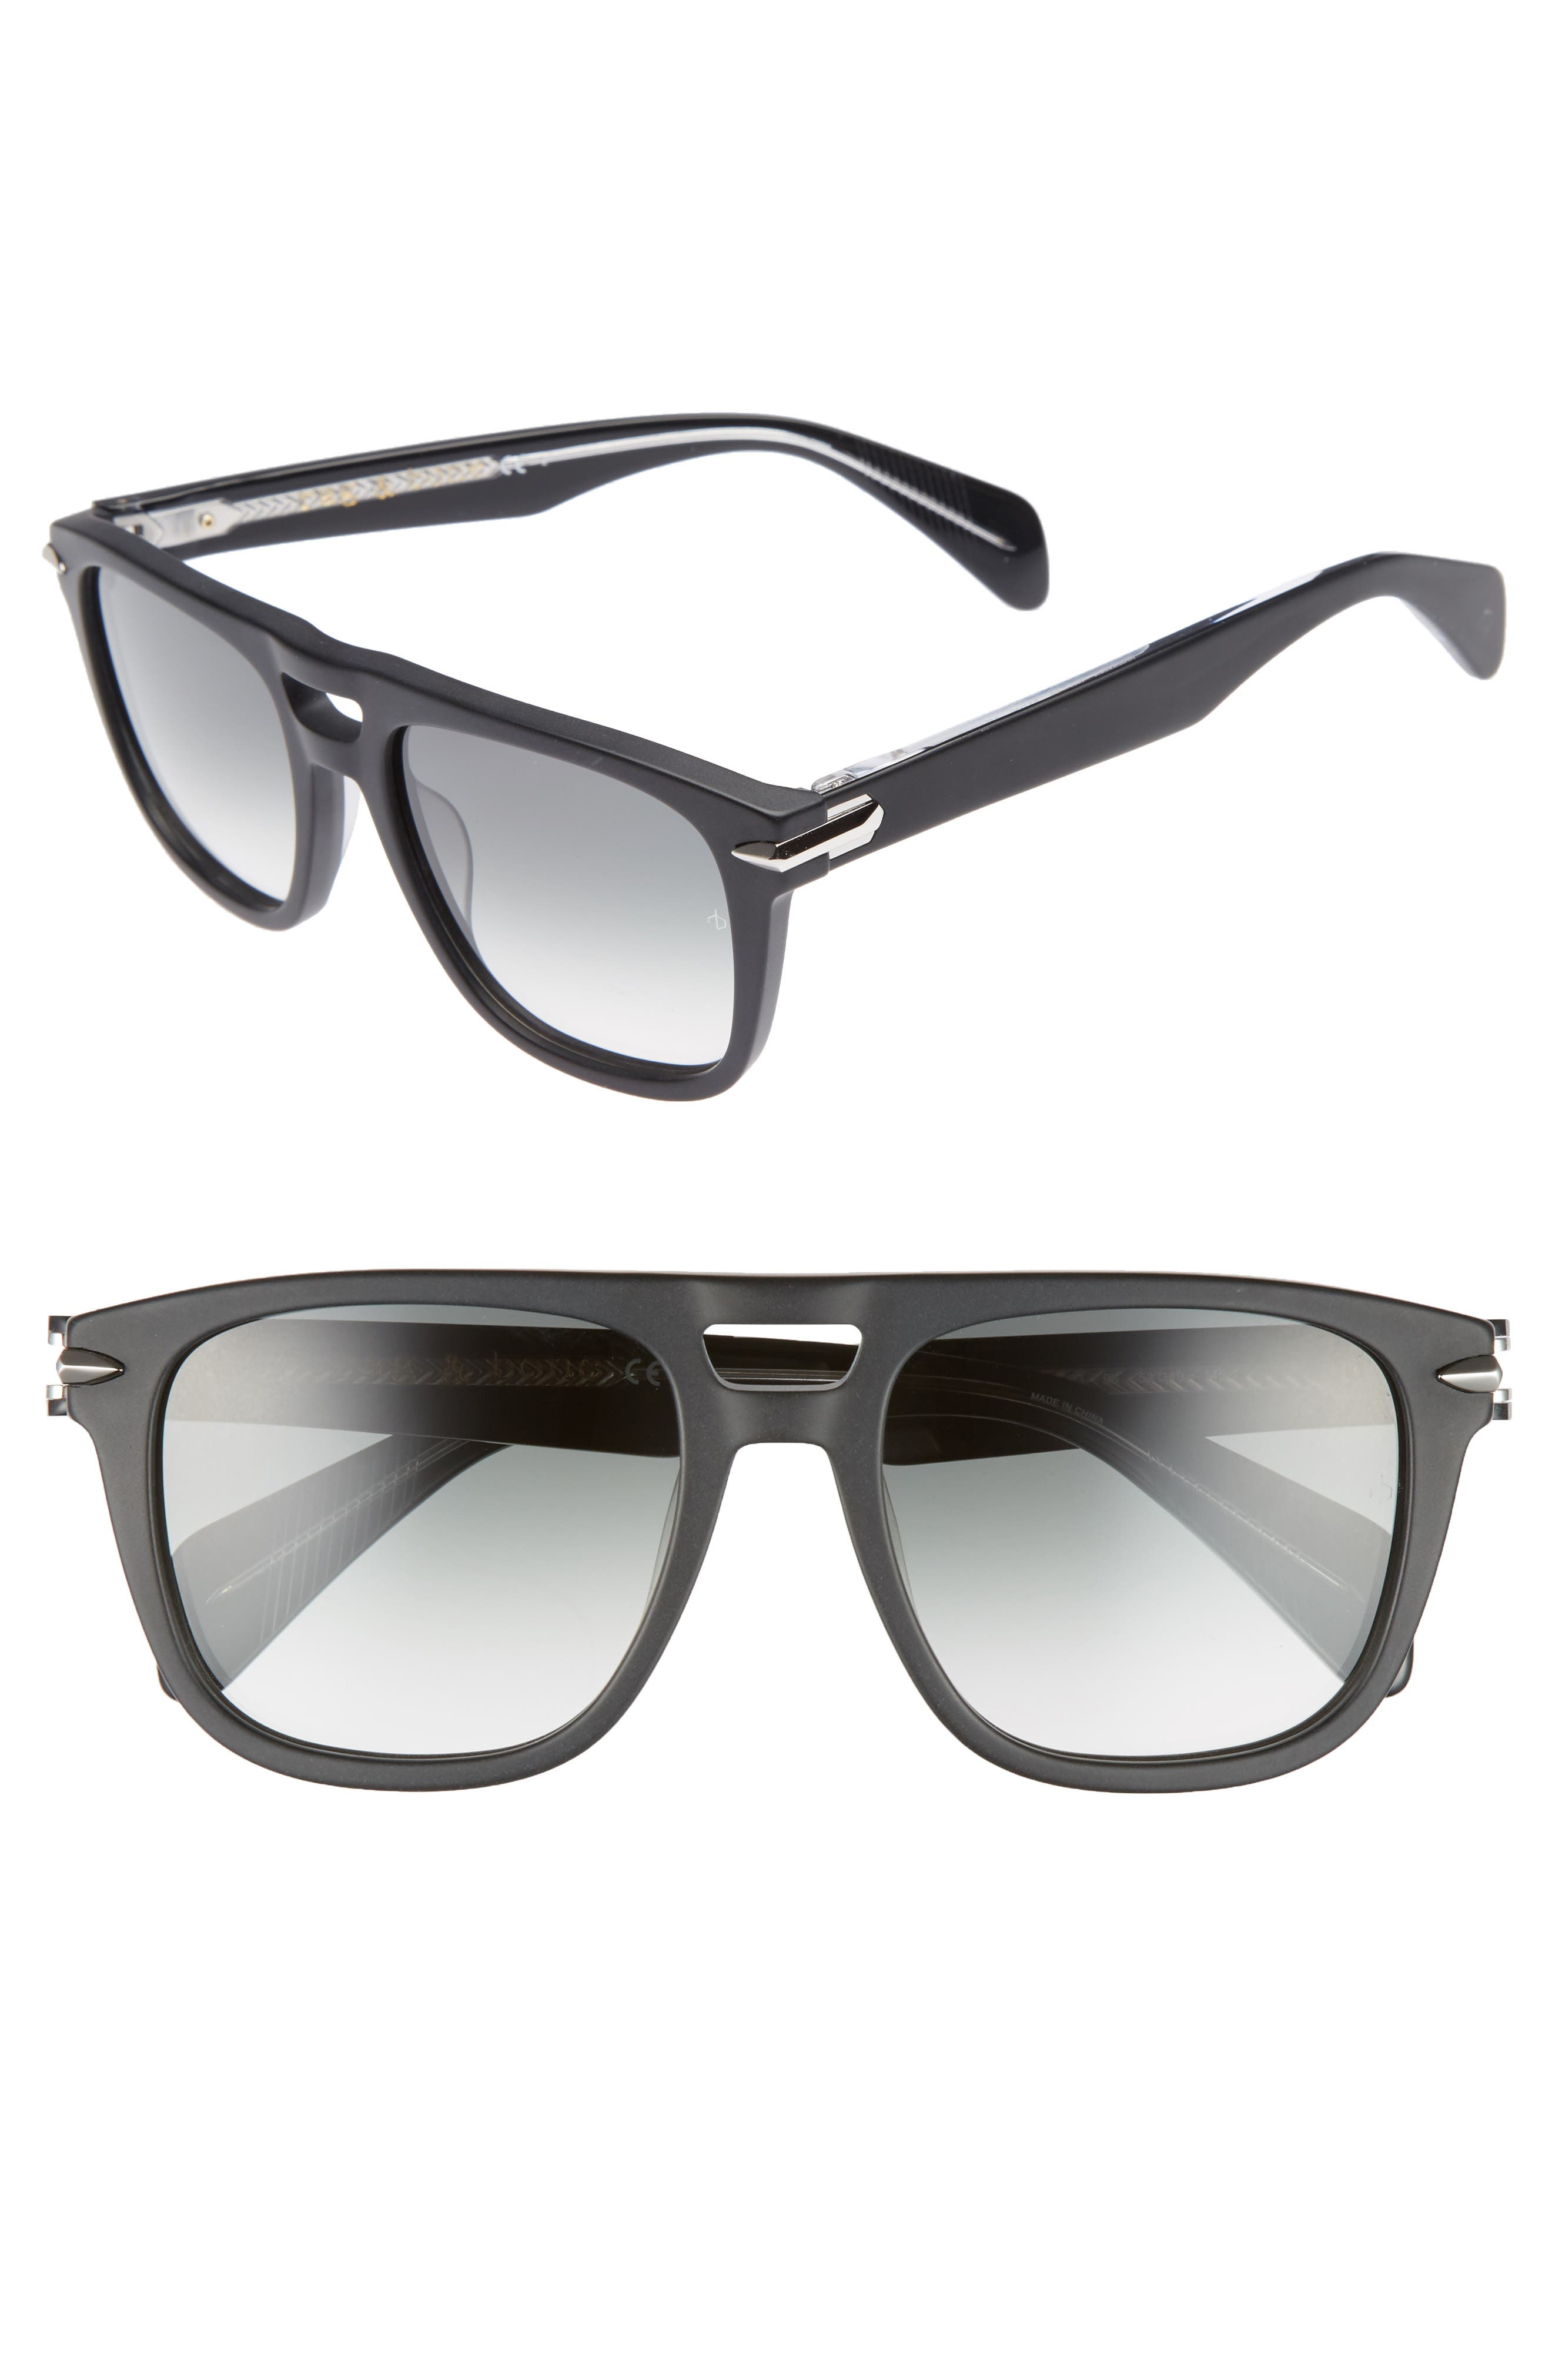 53mm Sunglasses,                             Main thumbnail 1, color,                             Matte Black